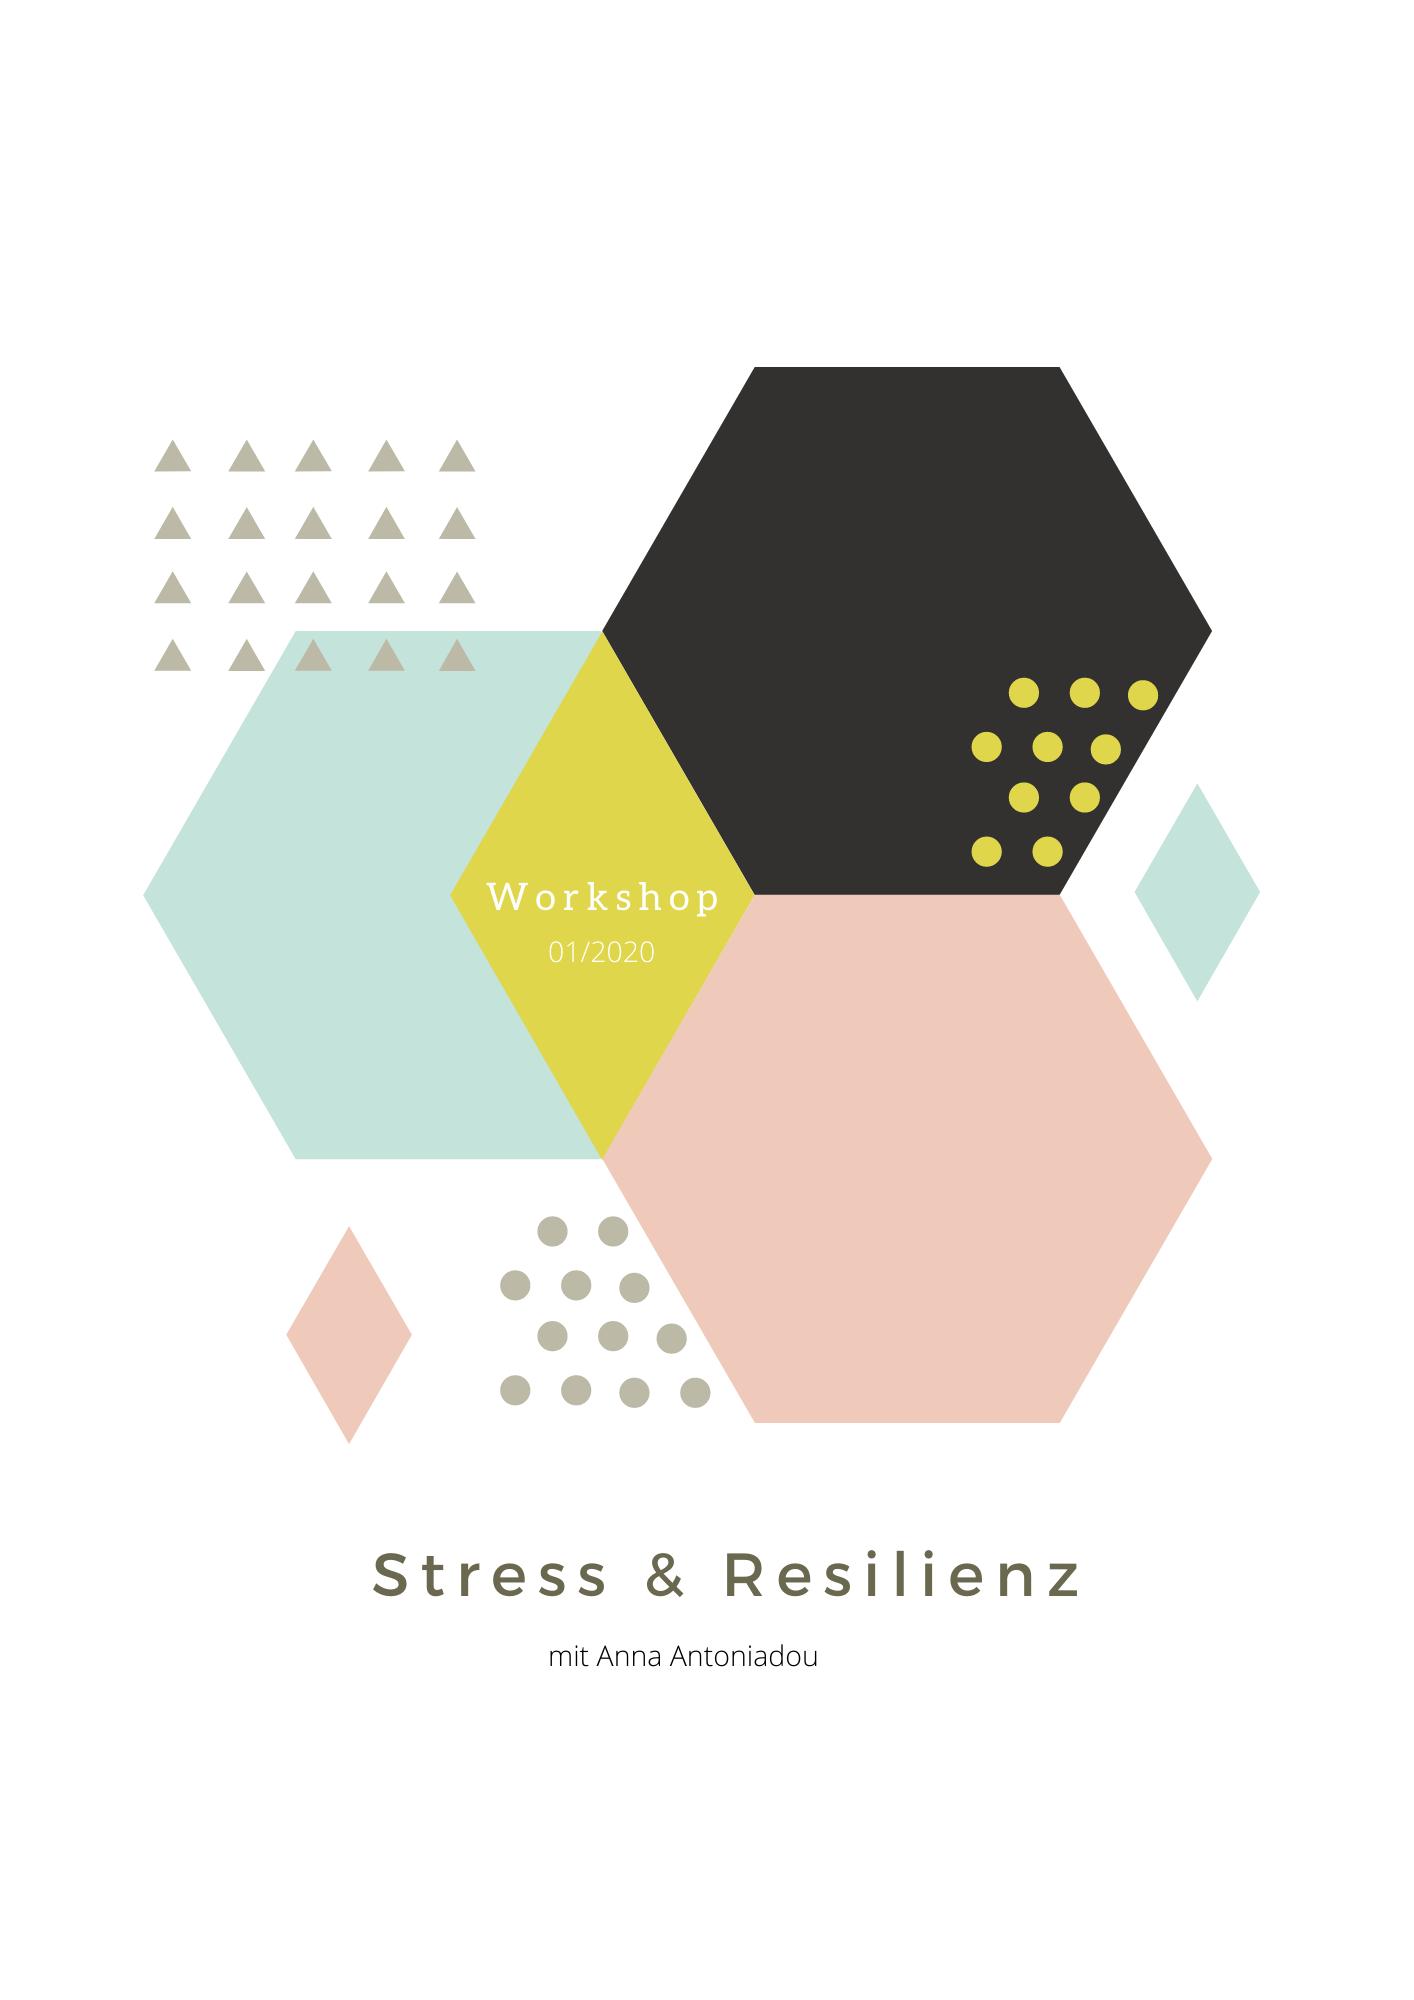 Workshop Stress & Resilienz